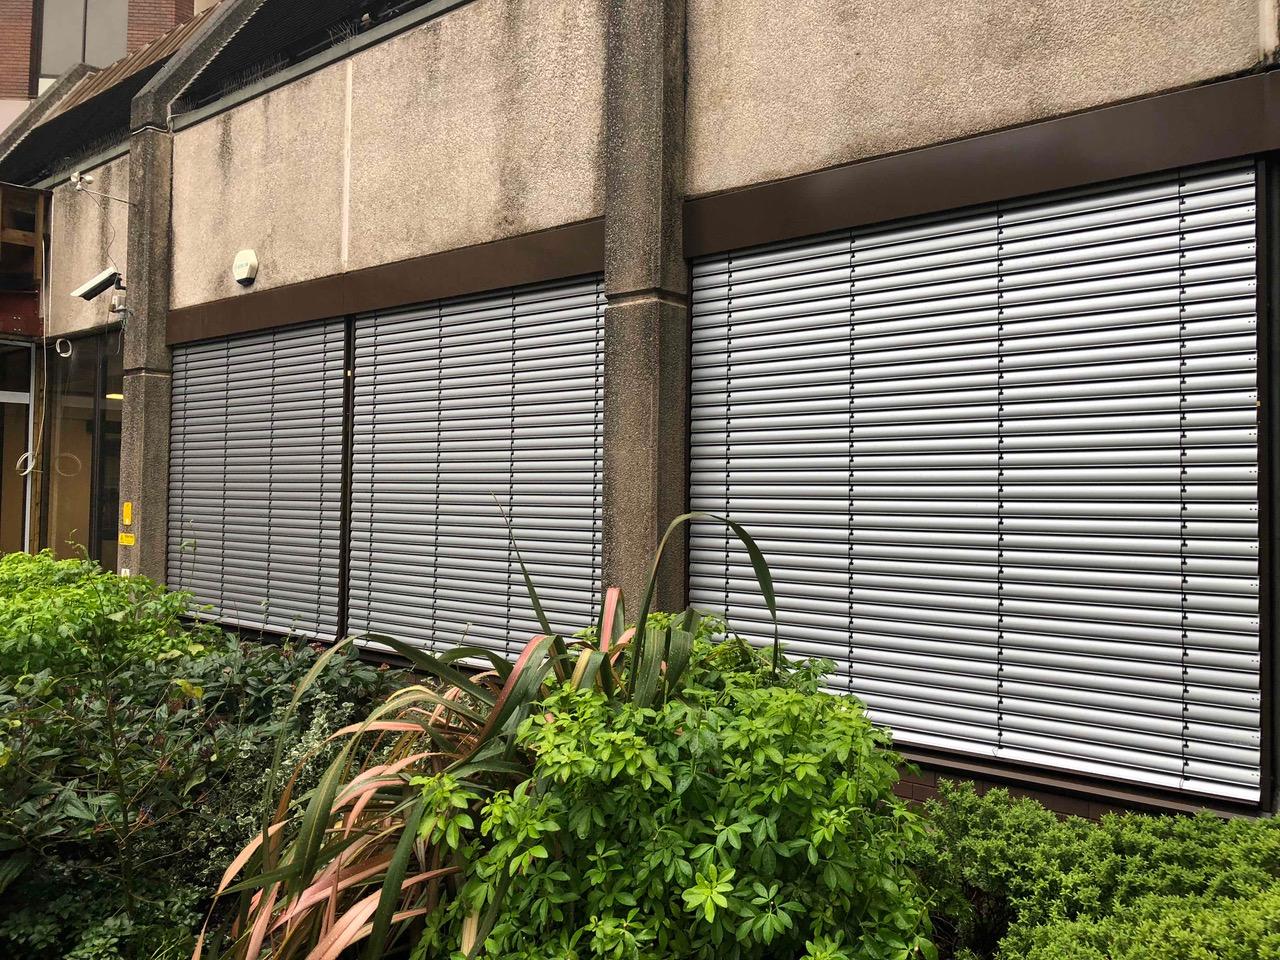 Warema UK External Venetian Blinds with Climatronic Controls Woking town